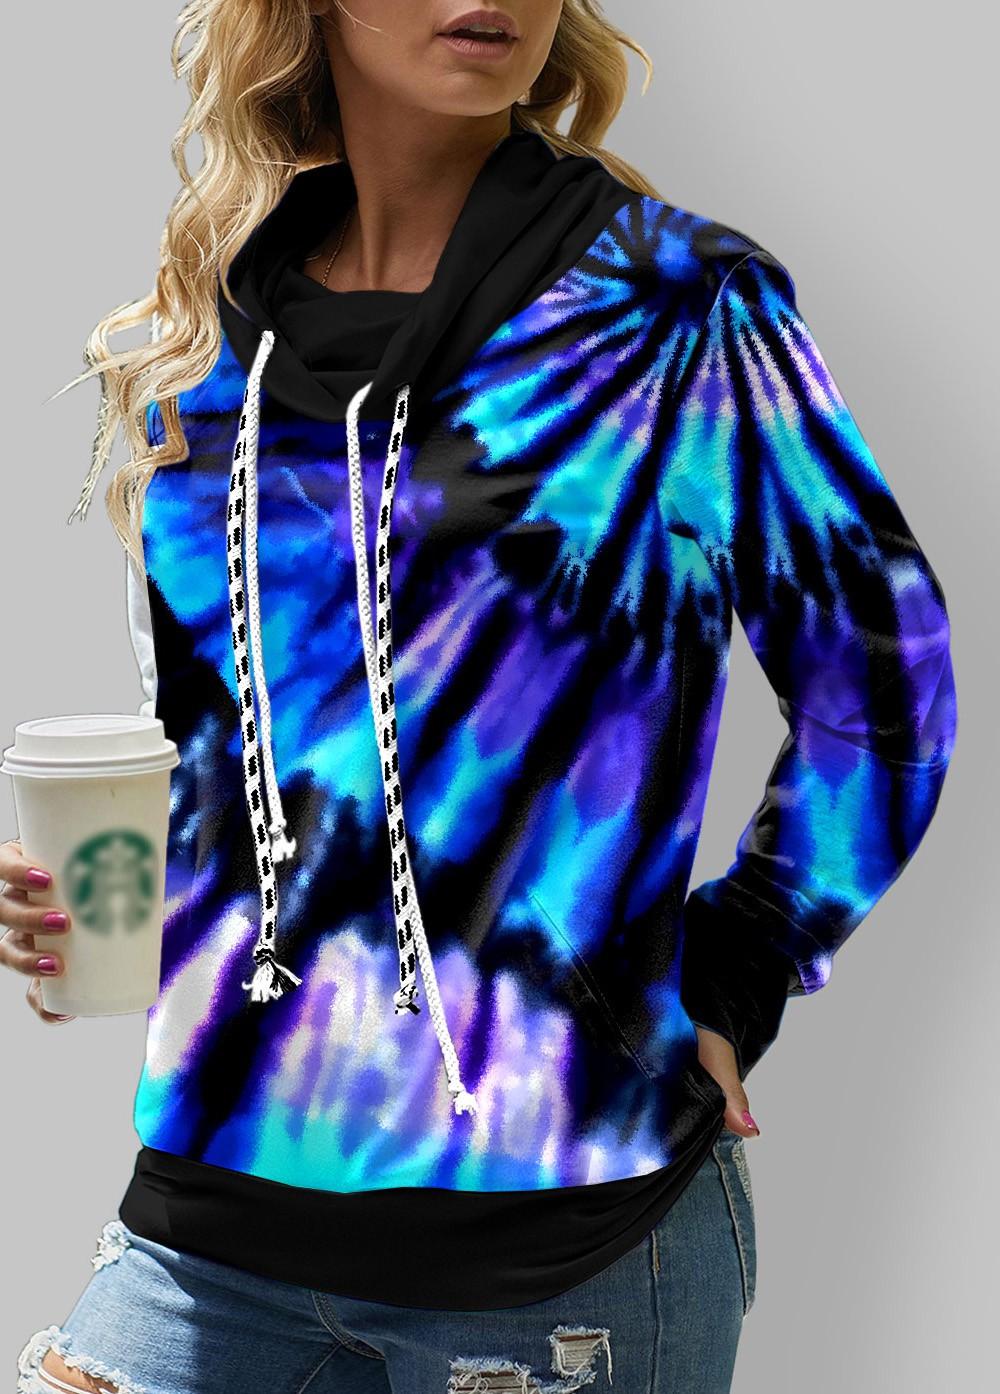 ROTITA Tie Dye Print Cowl Neck Long Sleeve Sweatshirt